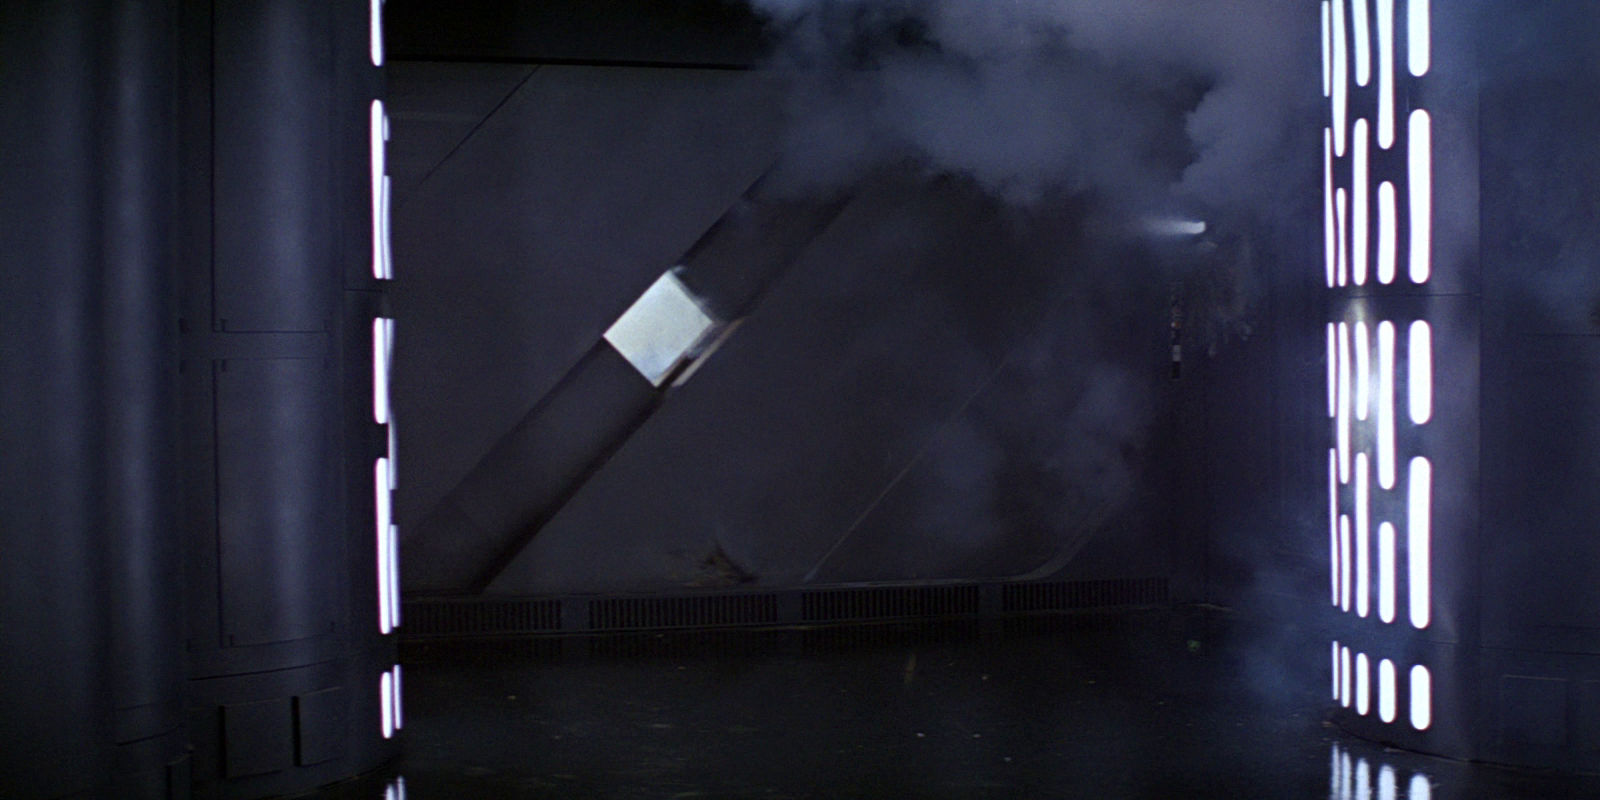 Death Star blast door.png & Image - Death Star blast door.png | Wookieepedia | FANDOM powered by ...